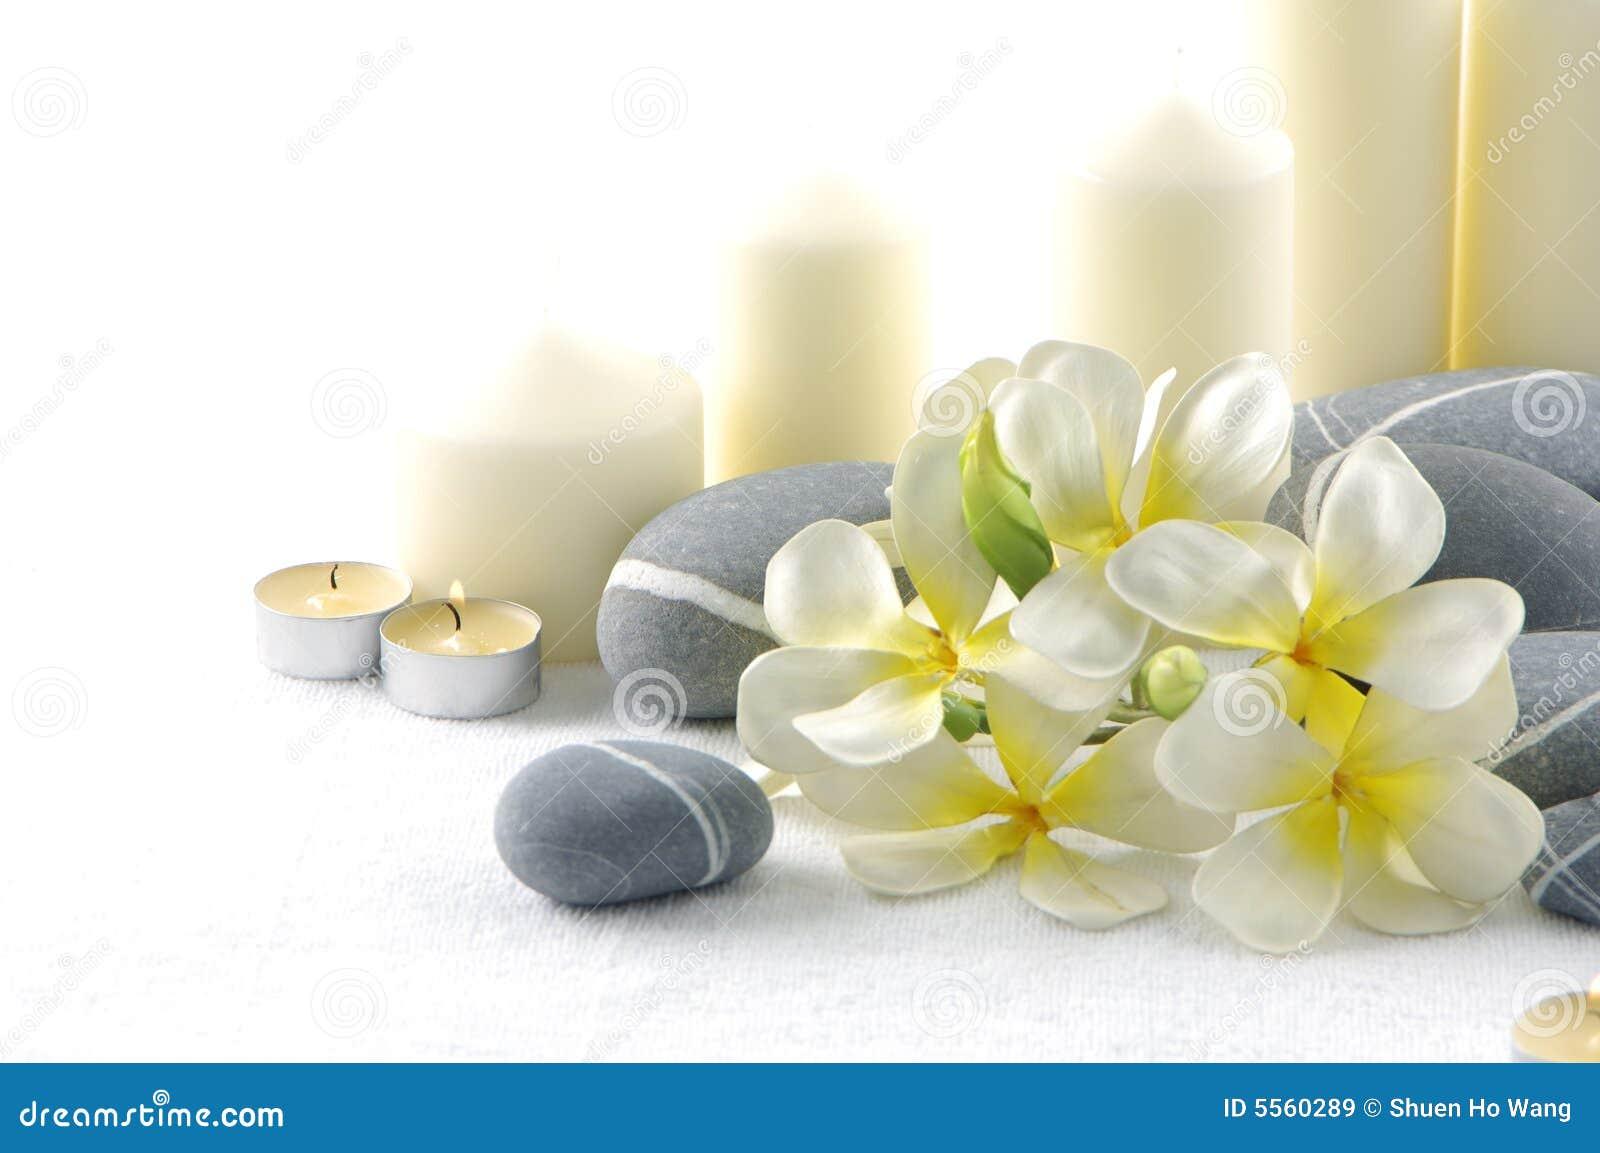 Frangipani spa flowers stock photo image 14654190 - Spa Item Royalty Free Stock Images